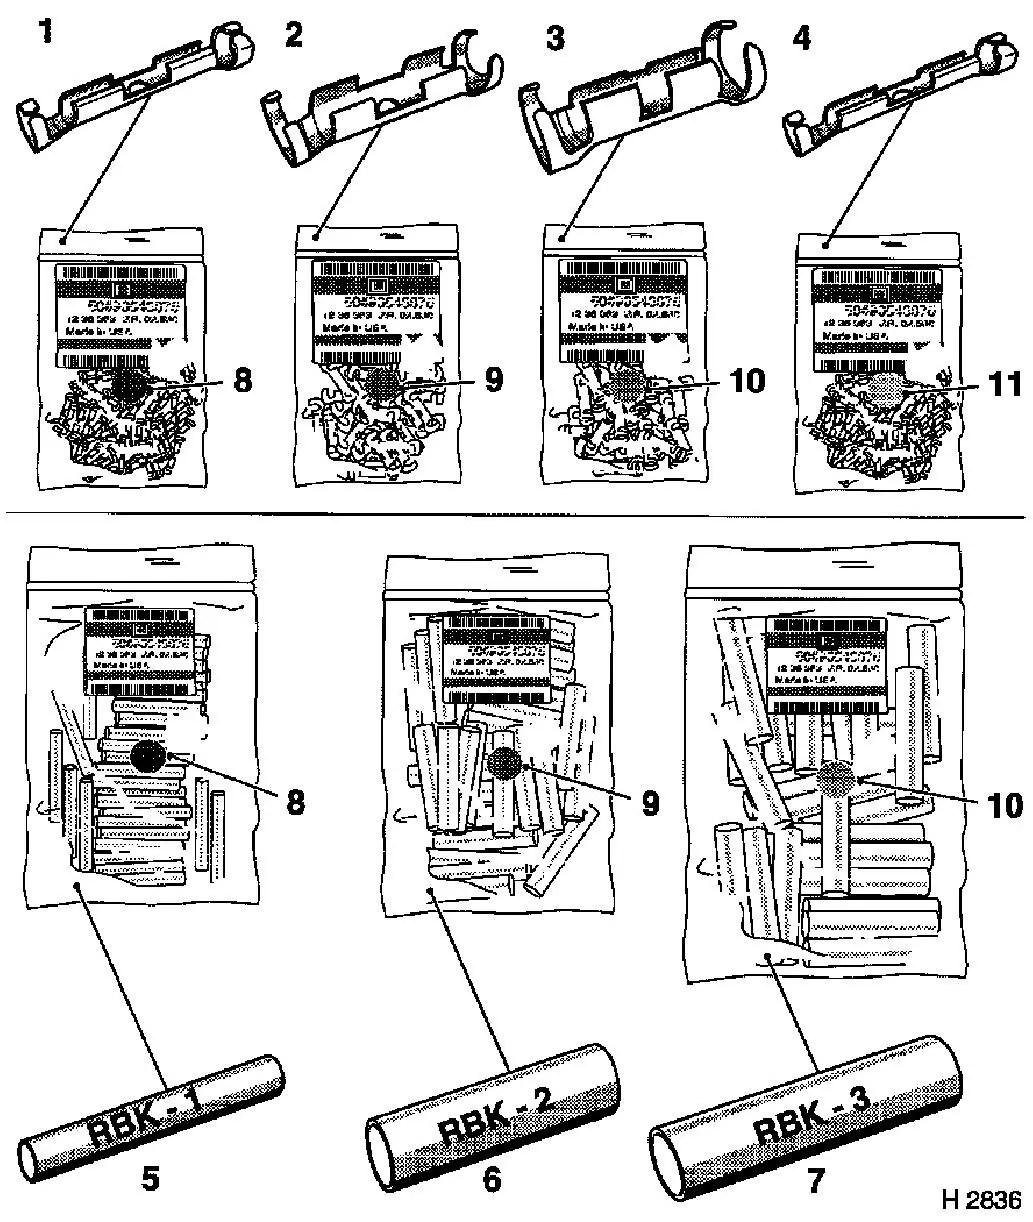 vauxhall vectra b wiring diagram ge dryer timer workshop manuals gt general vehicle